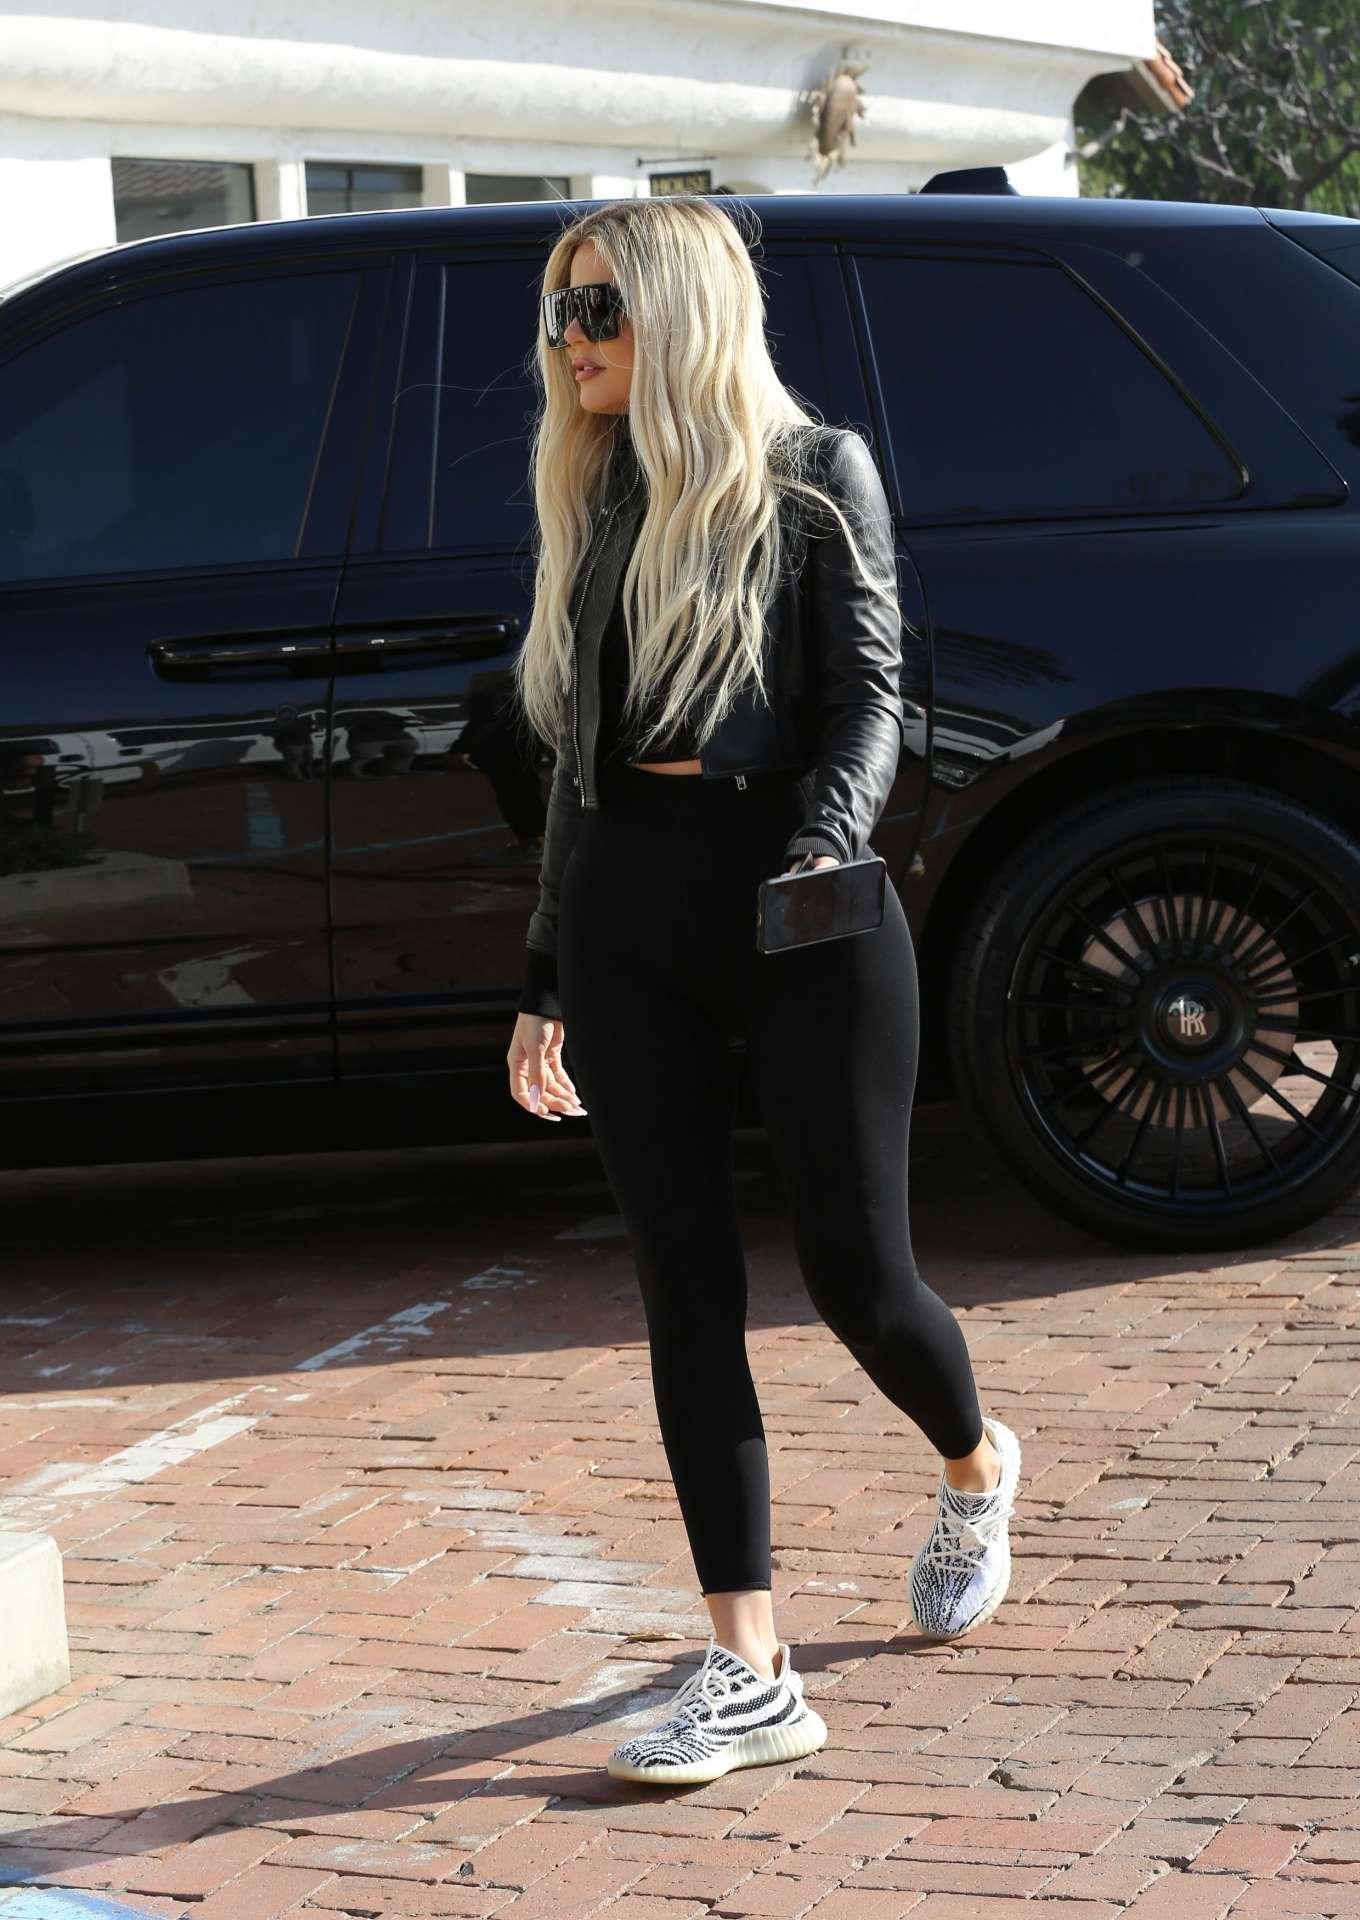 Khloe Kardashian 2019 : Khloe Kardashian – Shopping at Toy Crazy at the Malibu Country Mart-07